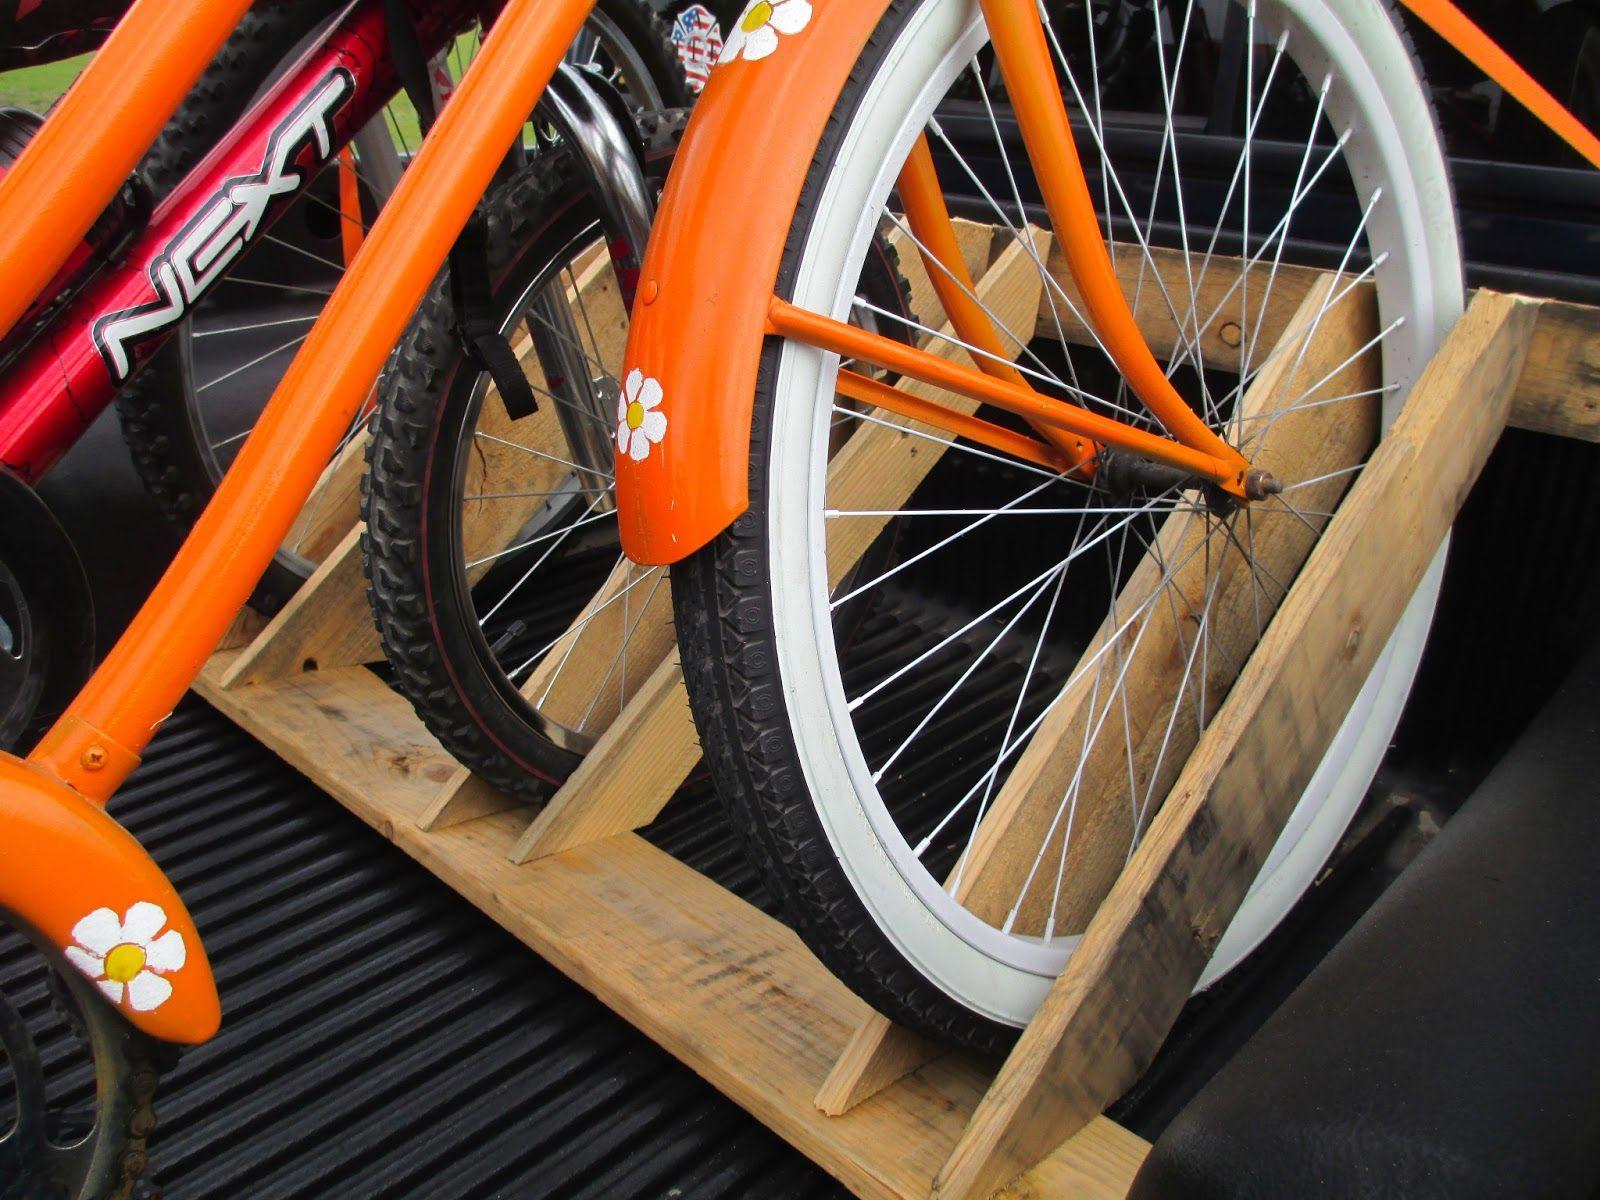 Diy bike rack for truck bed google search diy bike